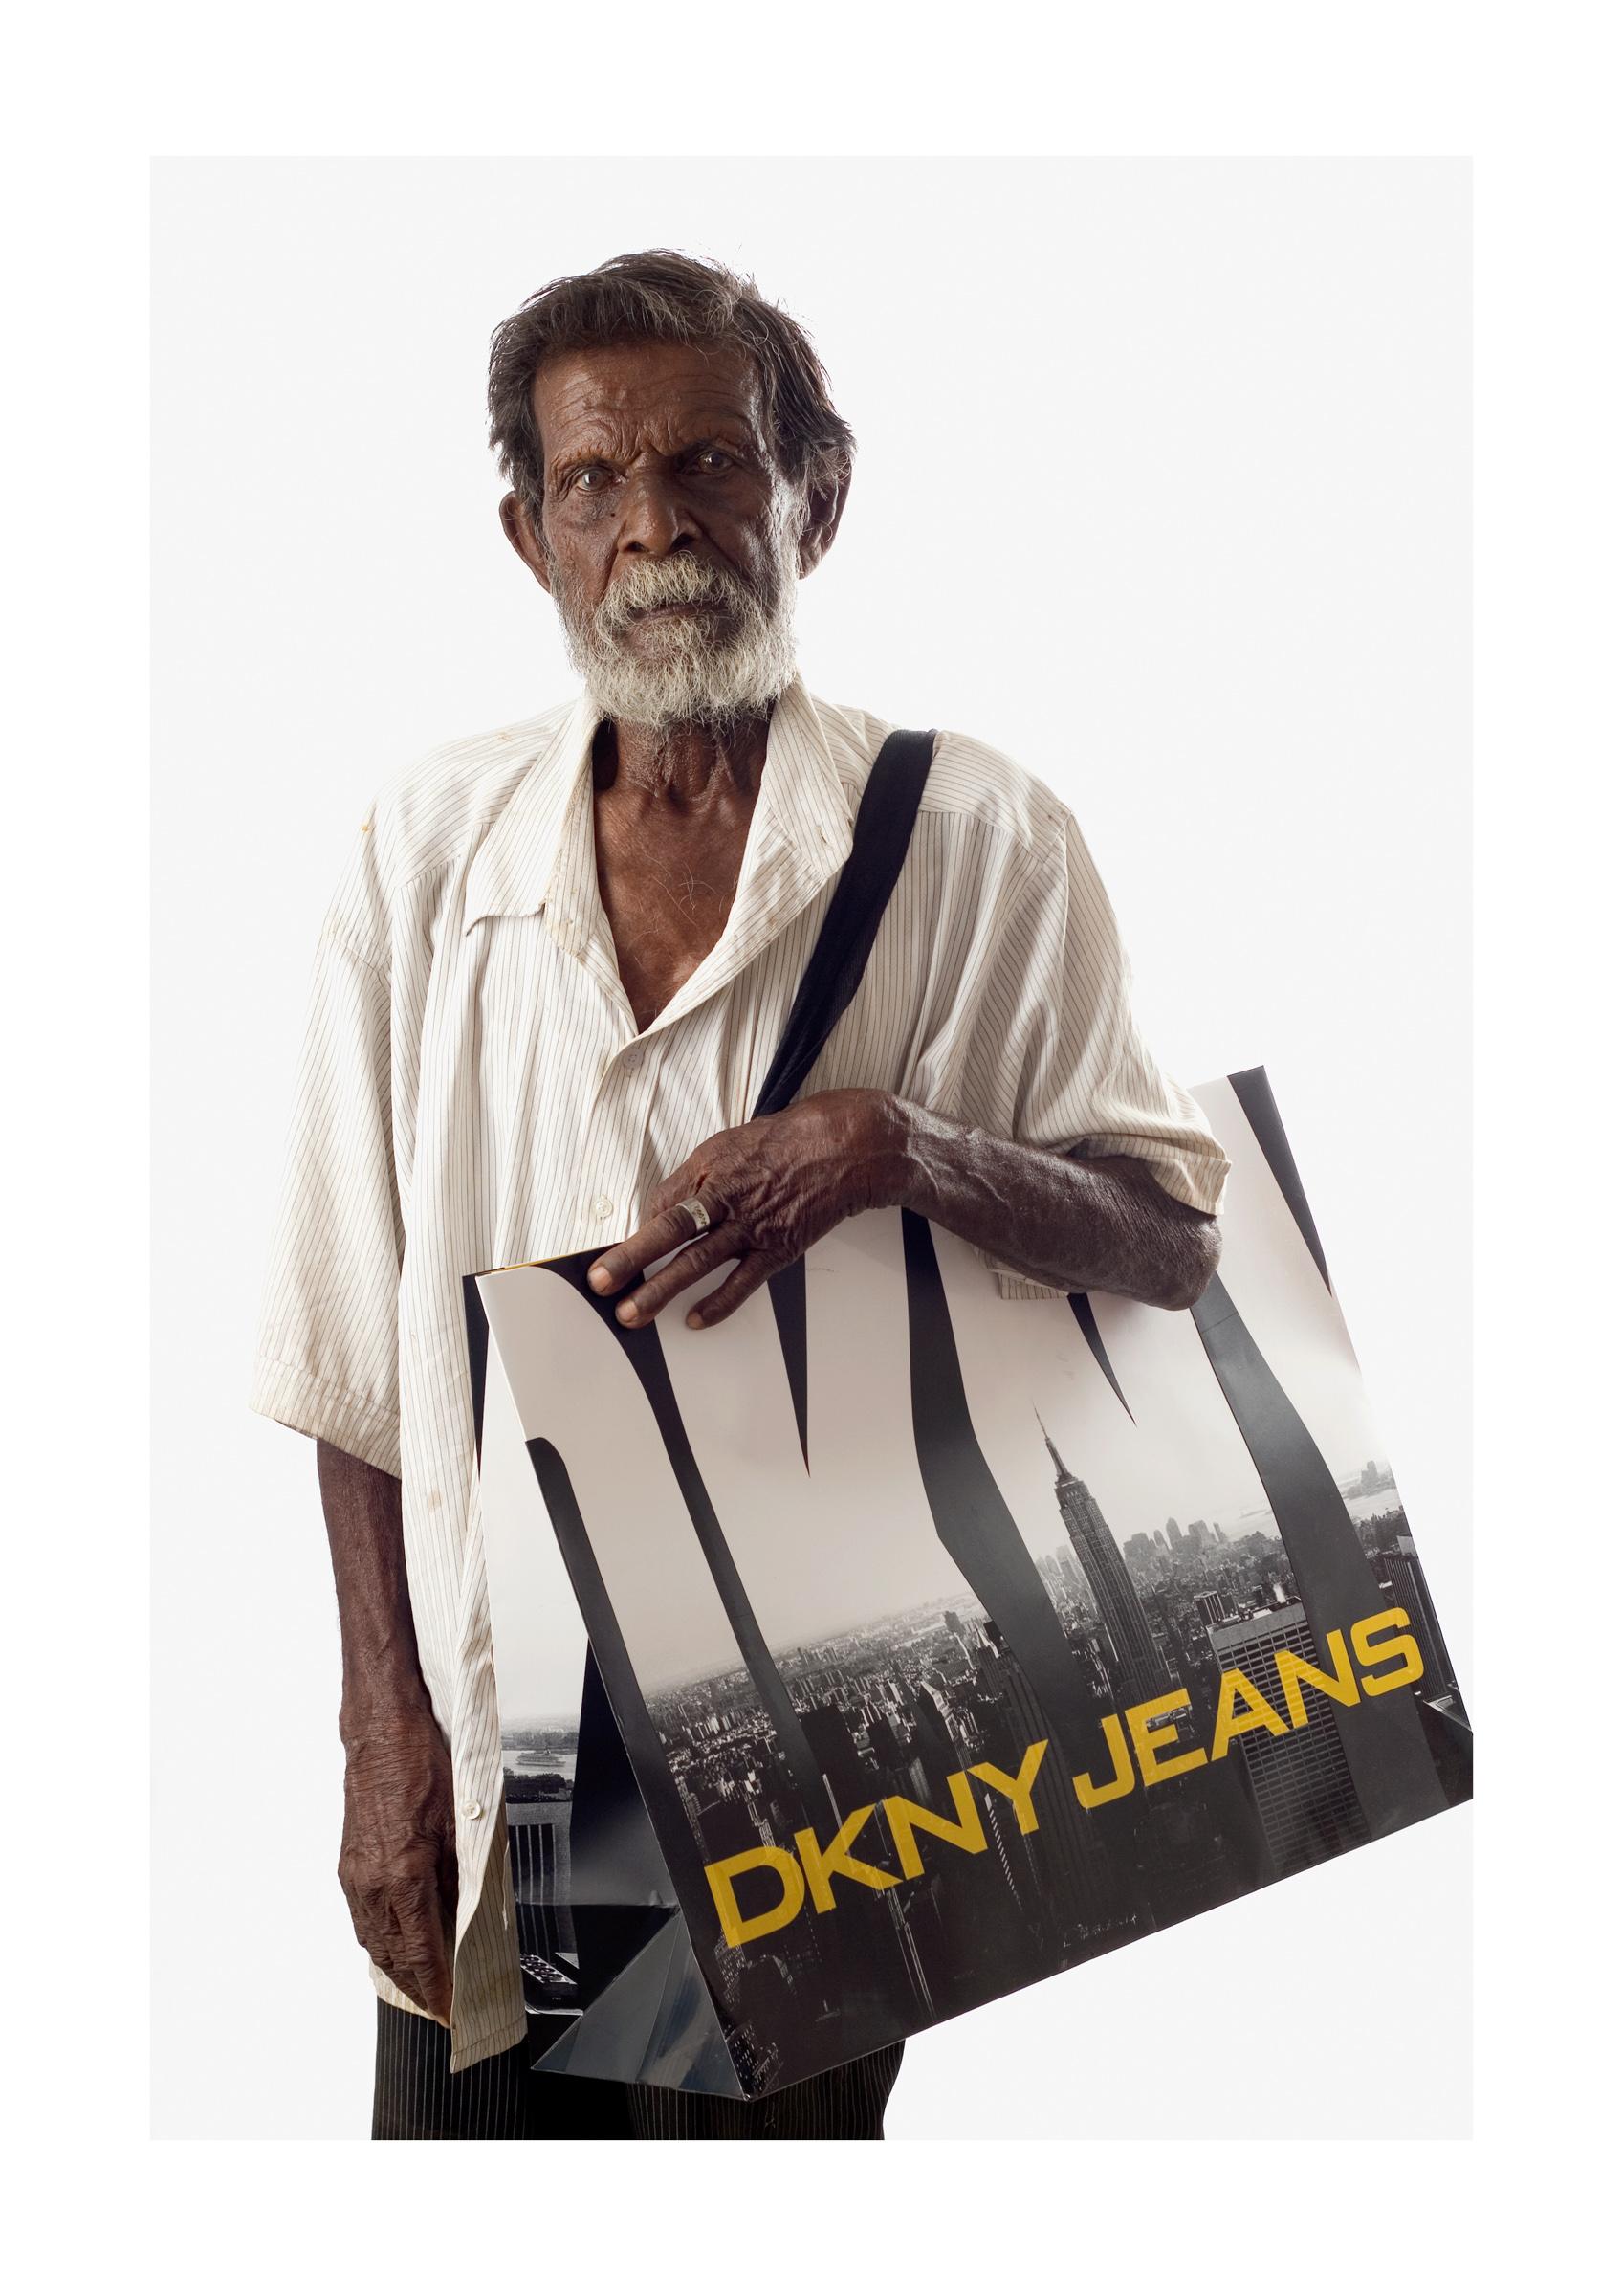 Kriator_Photographer_MindtheGap_DKNY Jeans 1.jpg